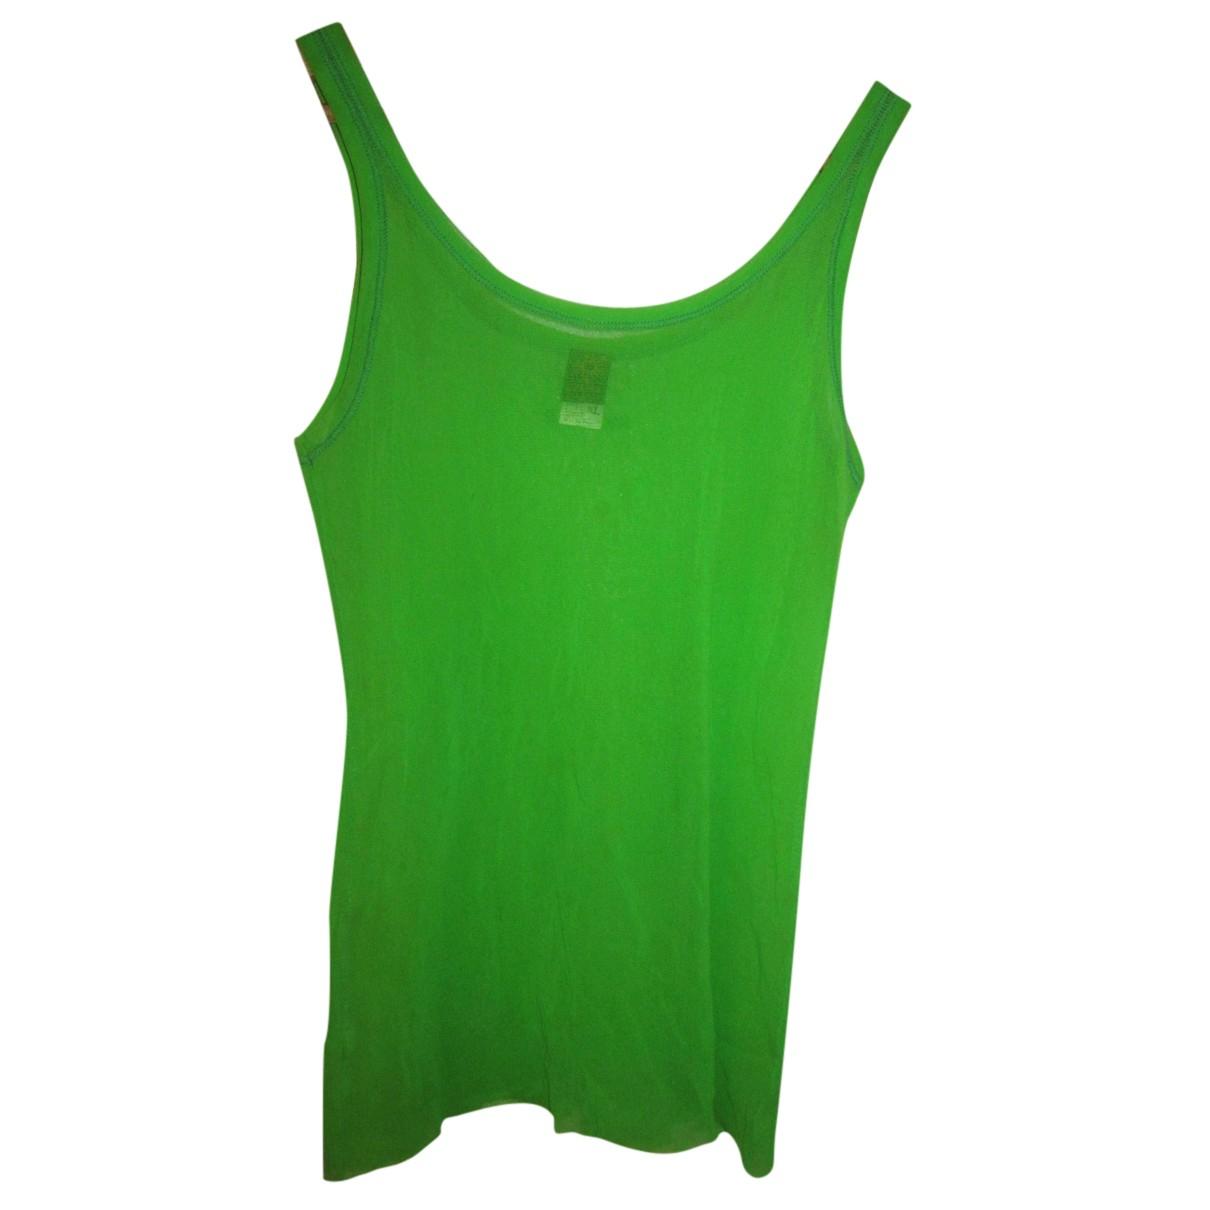 Jean Paul Gaultier - Top   pour femme - vert